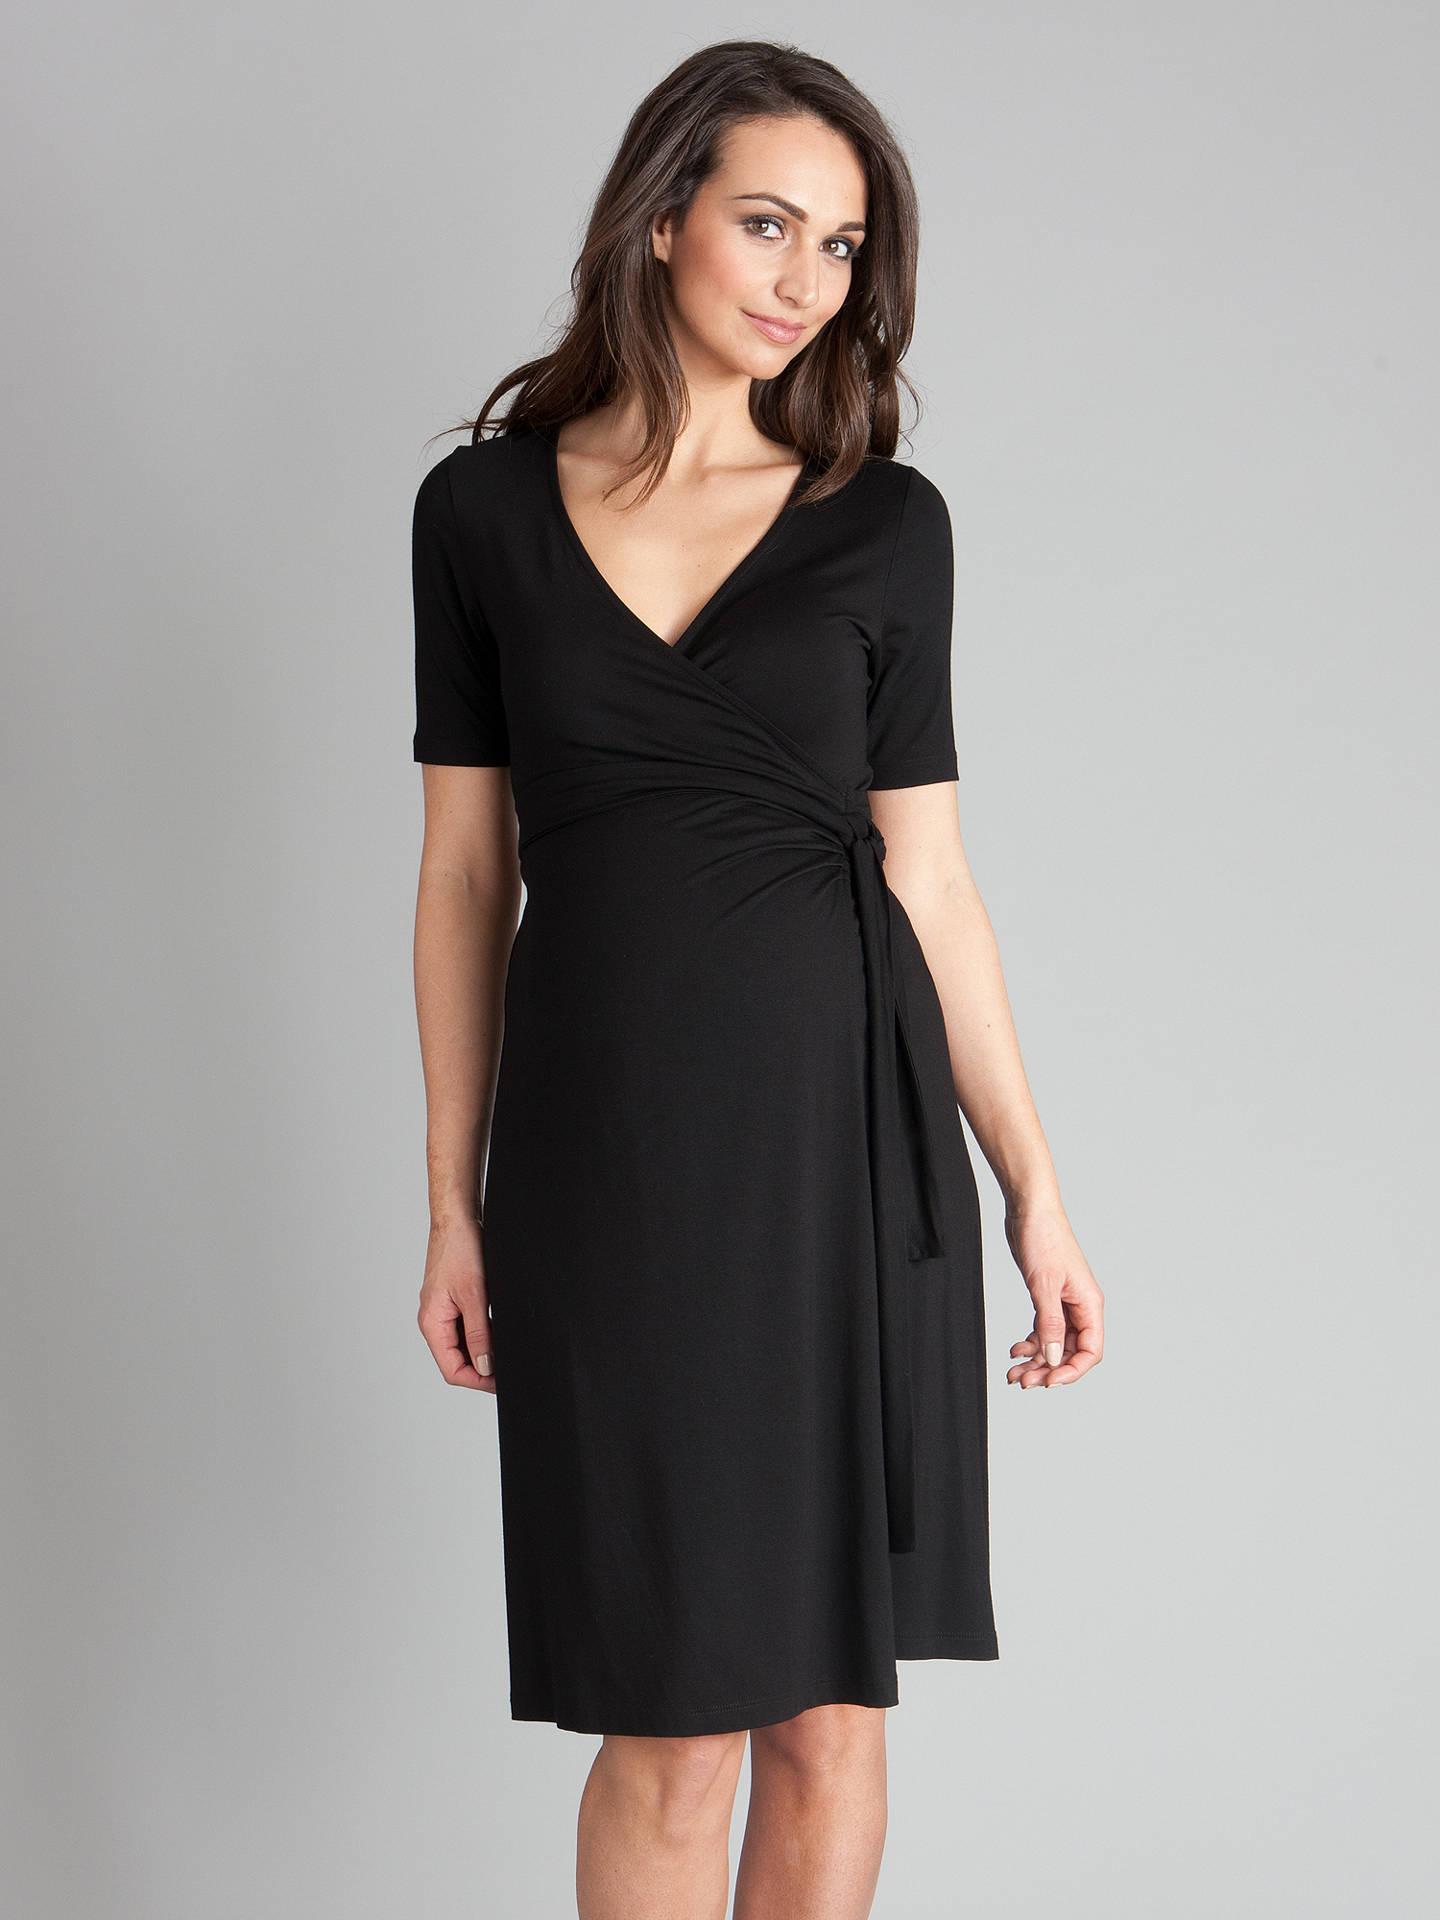 Seraphine Black Wrap Maternity Dress Work//Party 10